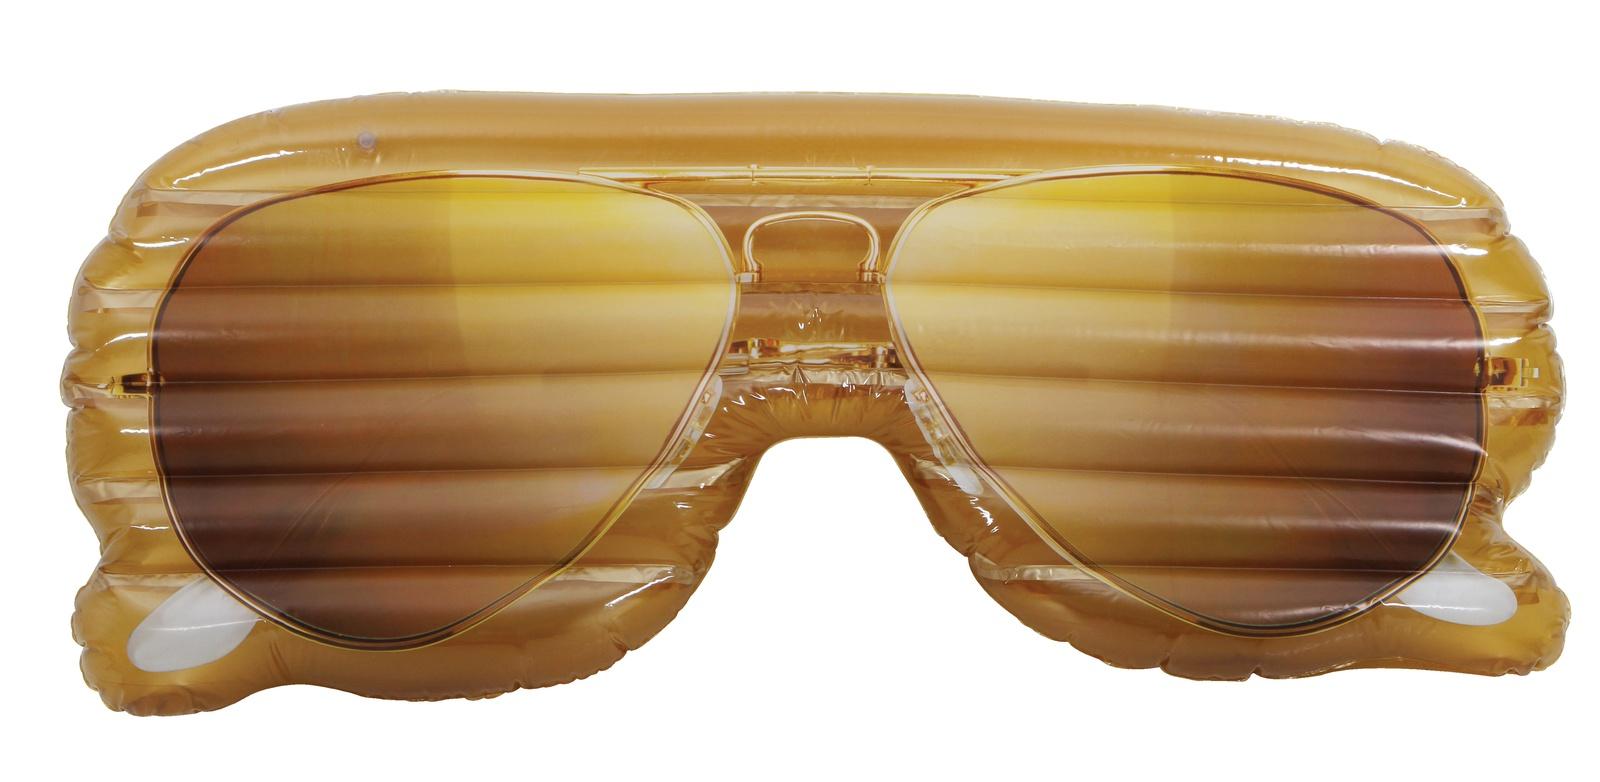 Матрас надувной Очки 175 х 71 х 14 см